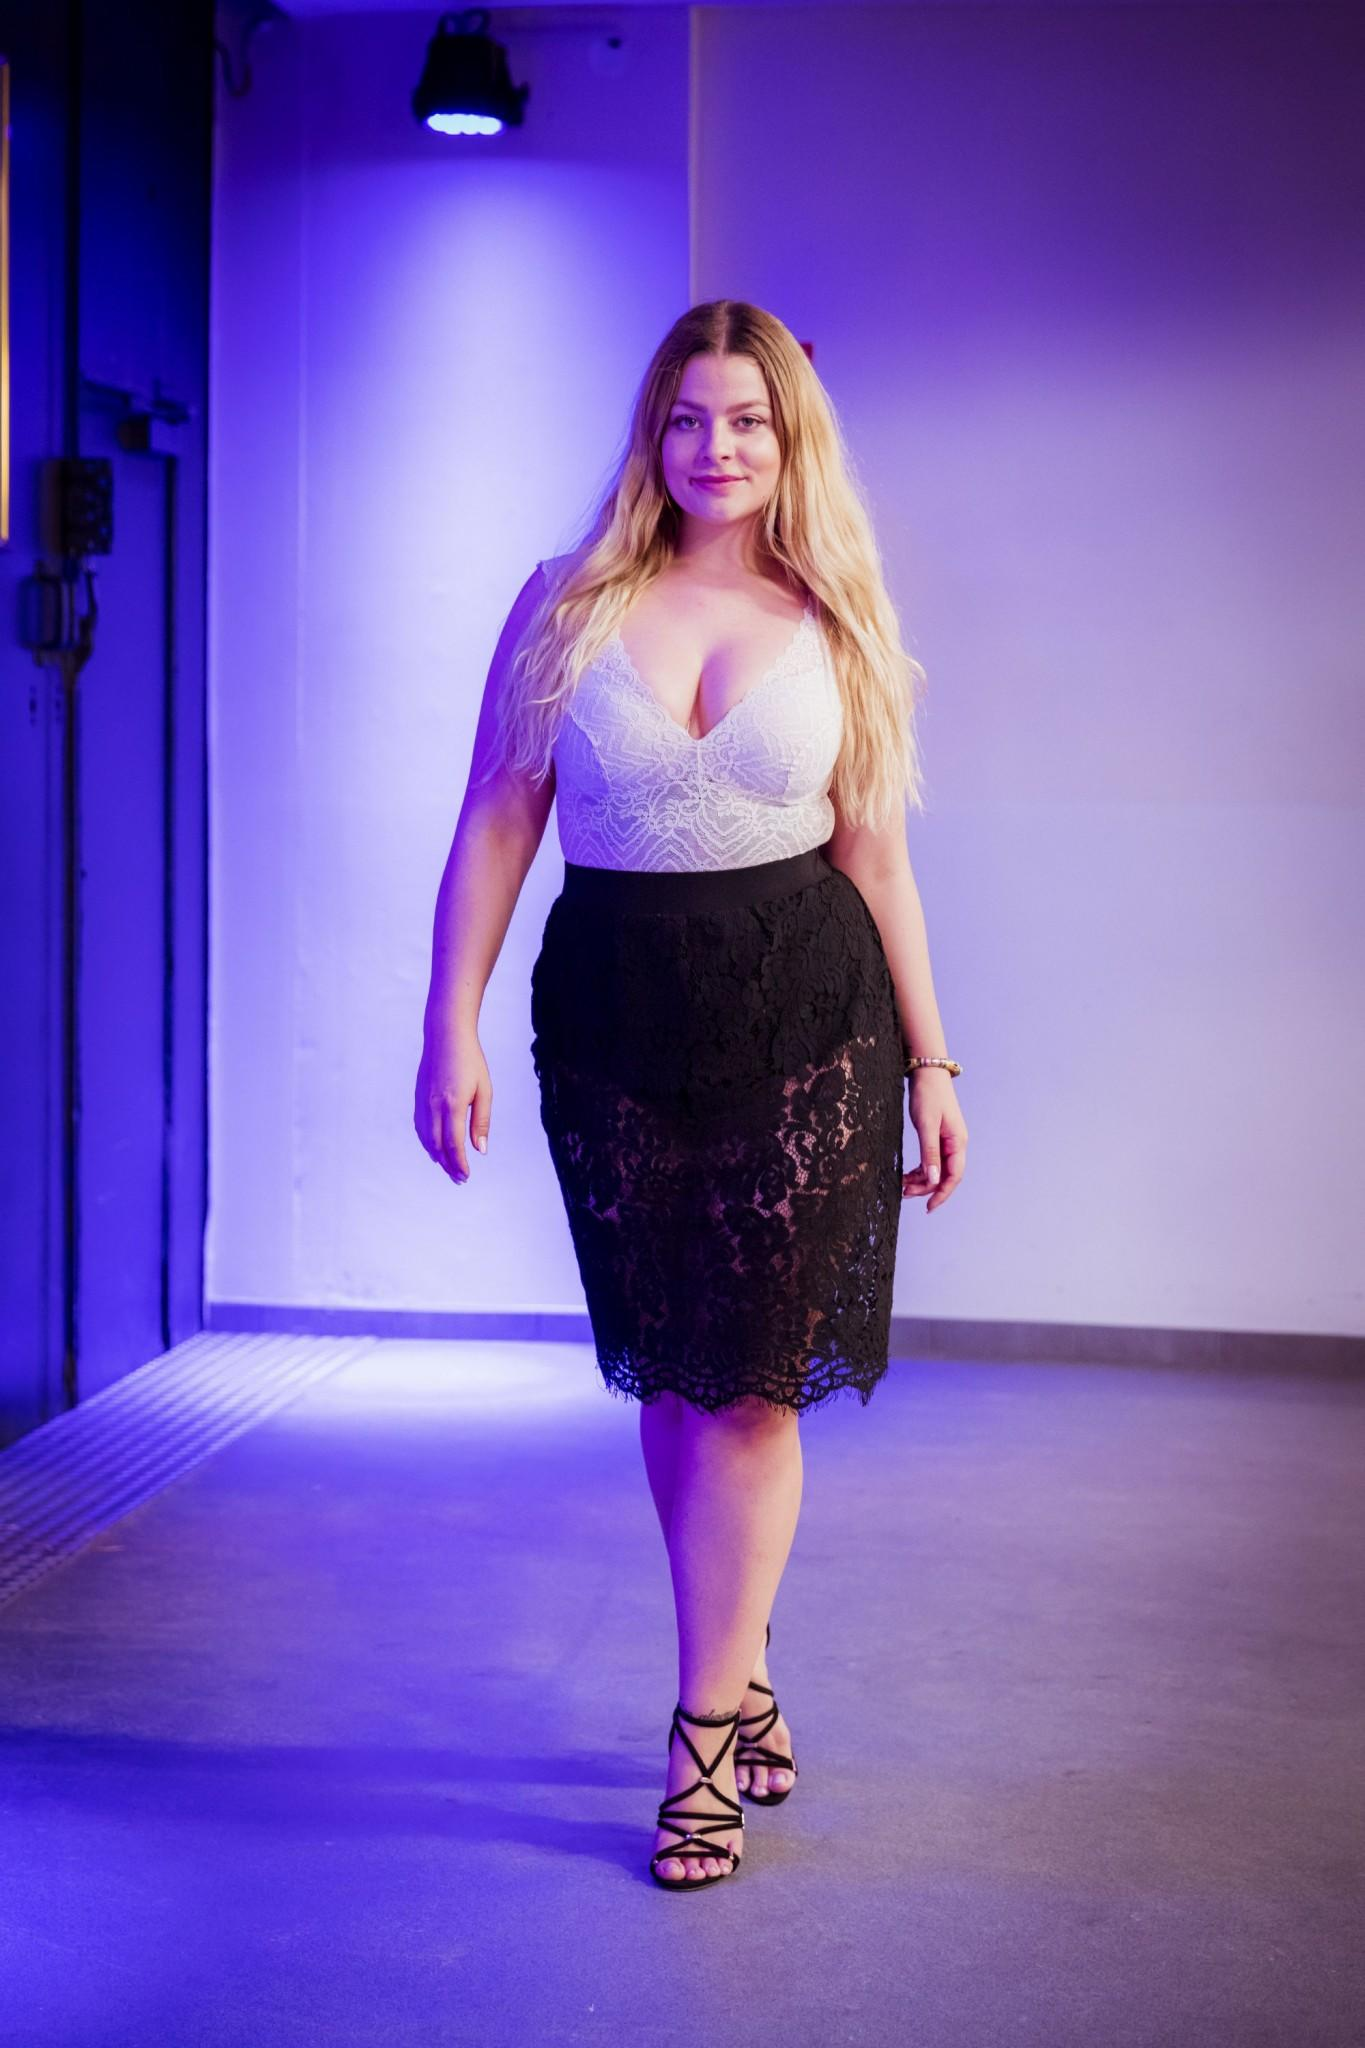 Curvy Supermodel 2019 Kandidatinnen